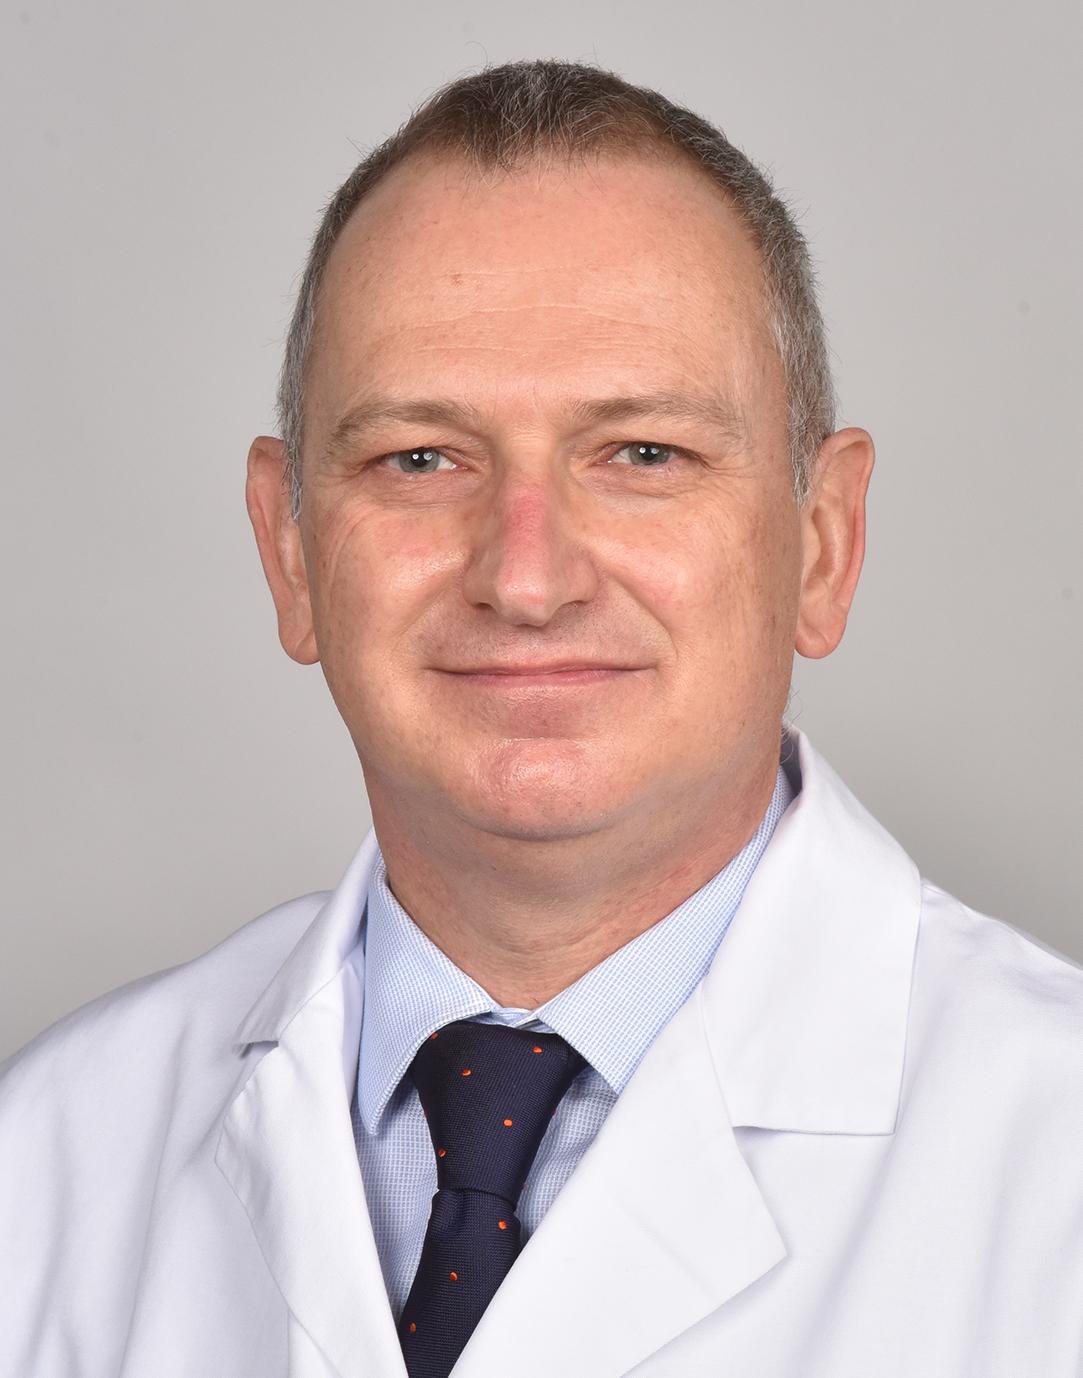 Tibor Serdült